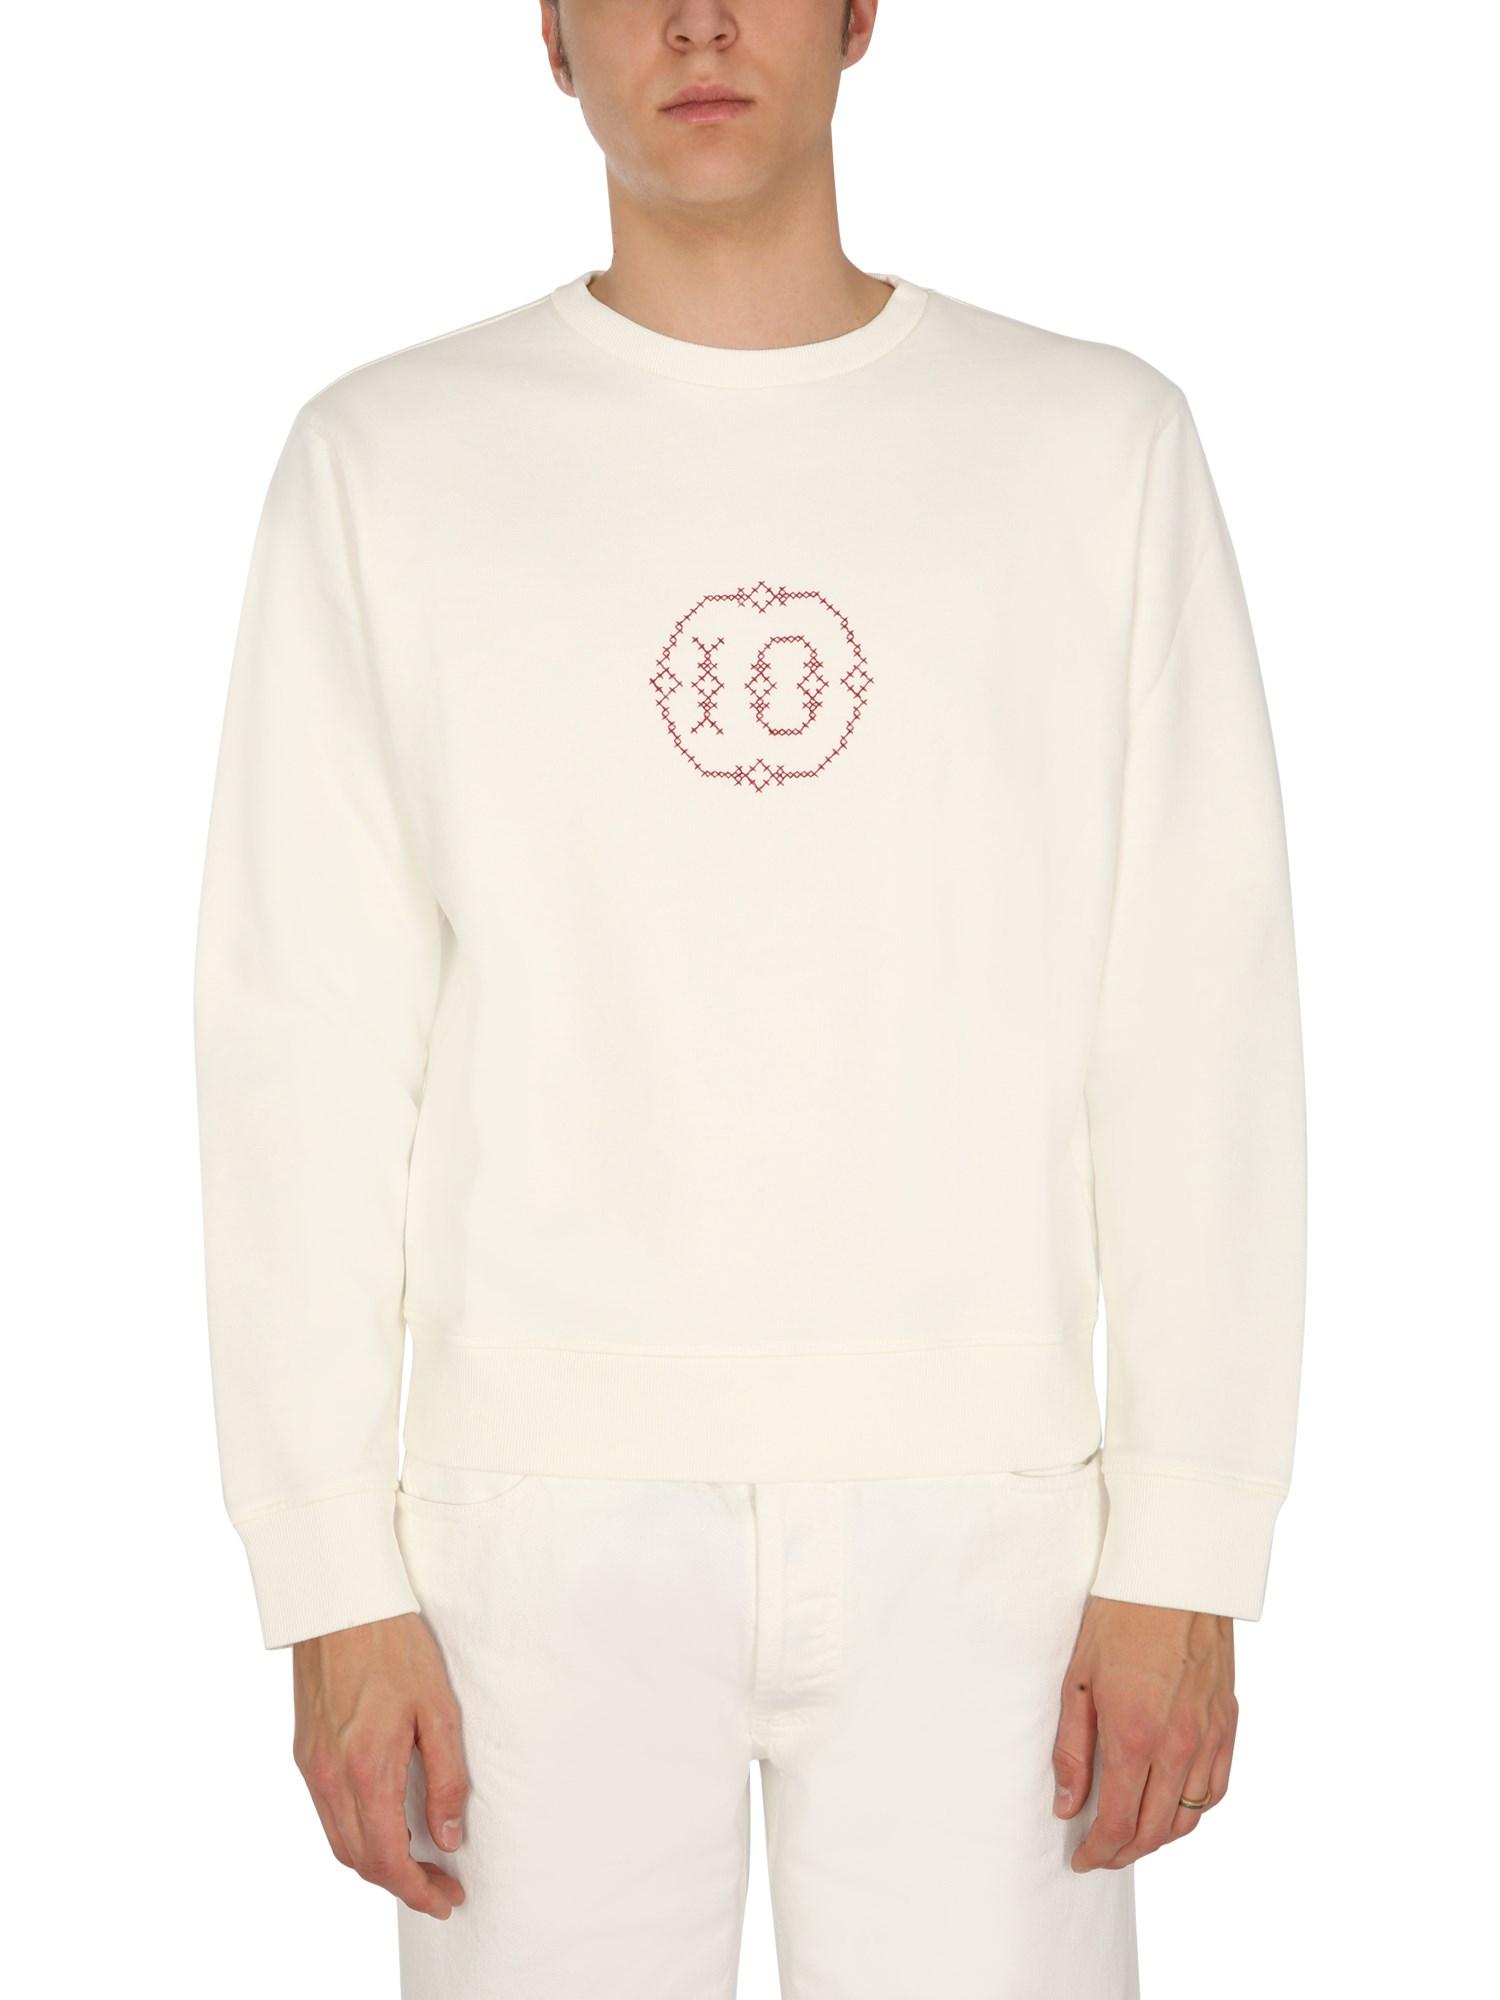 maison margiela embroidered sweatshirt